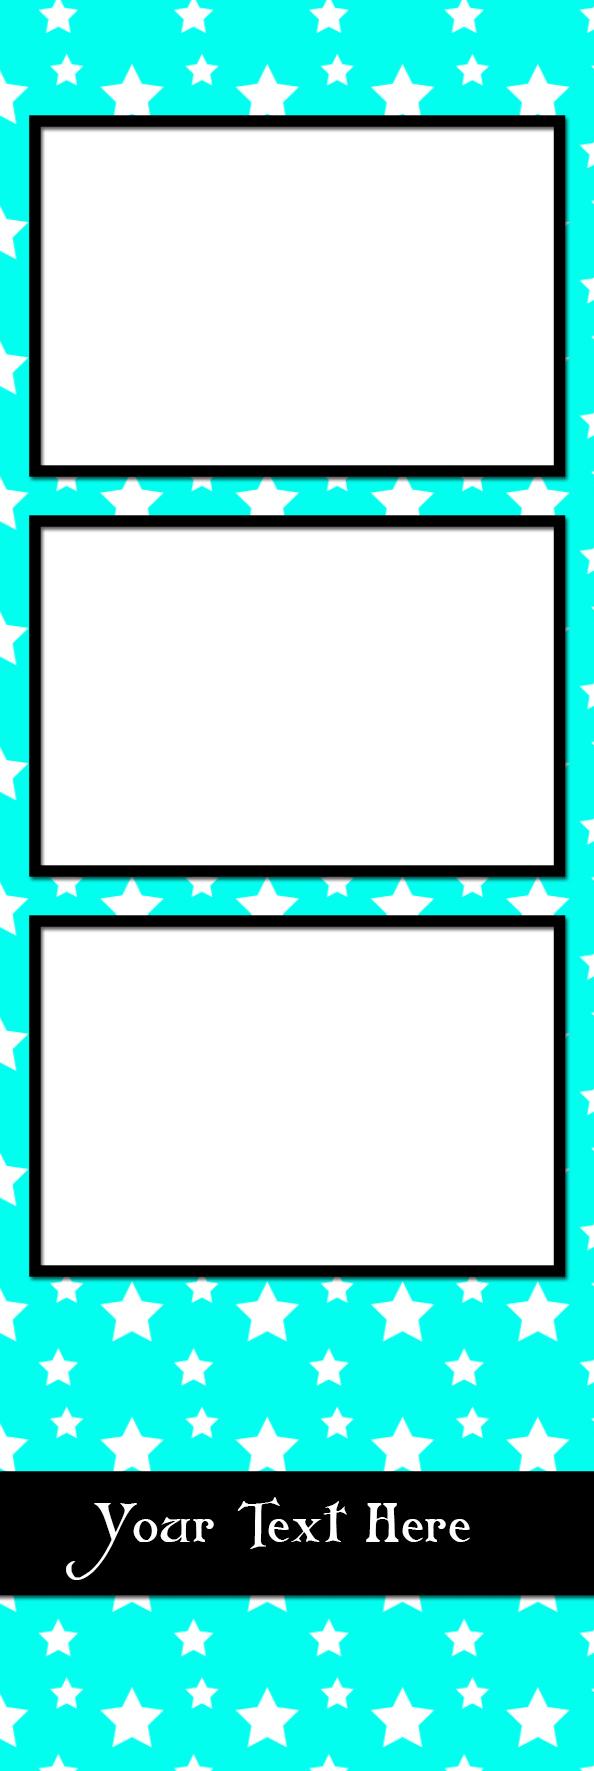 Texture_Stars-V-6P7.jpg